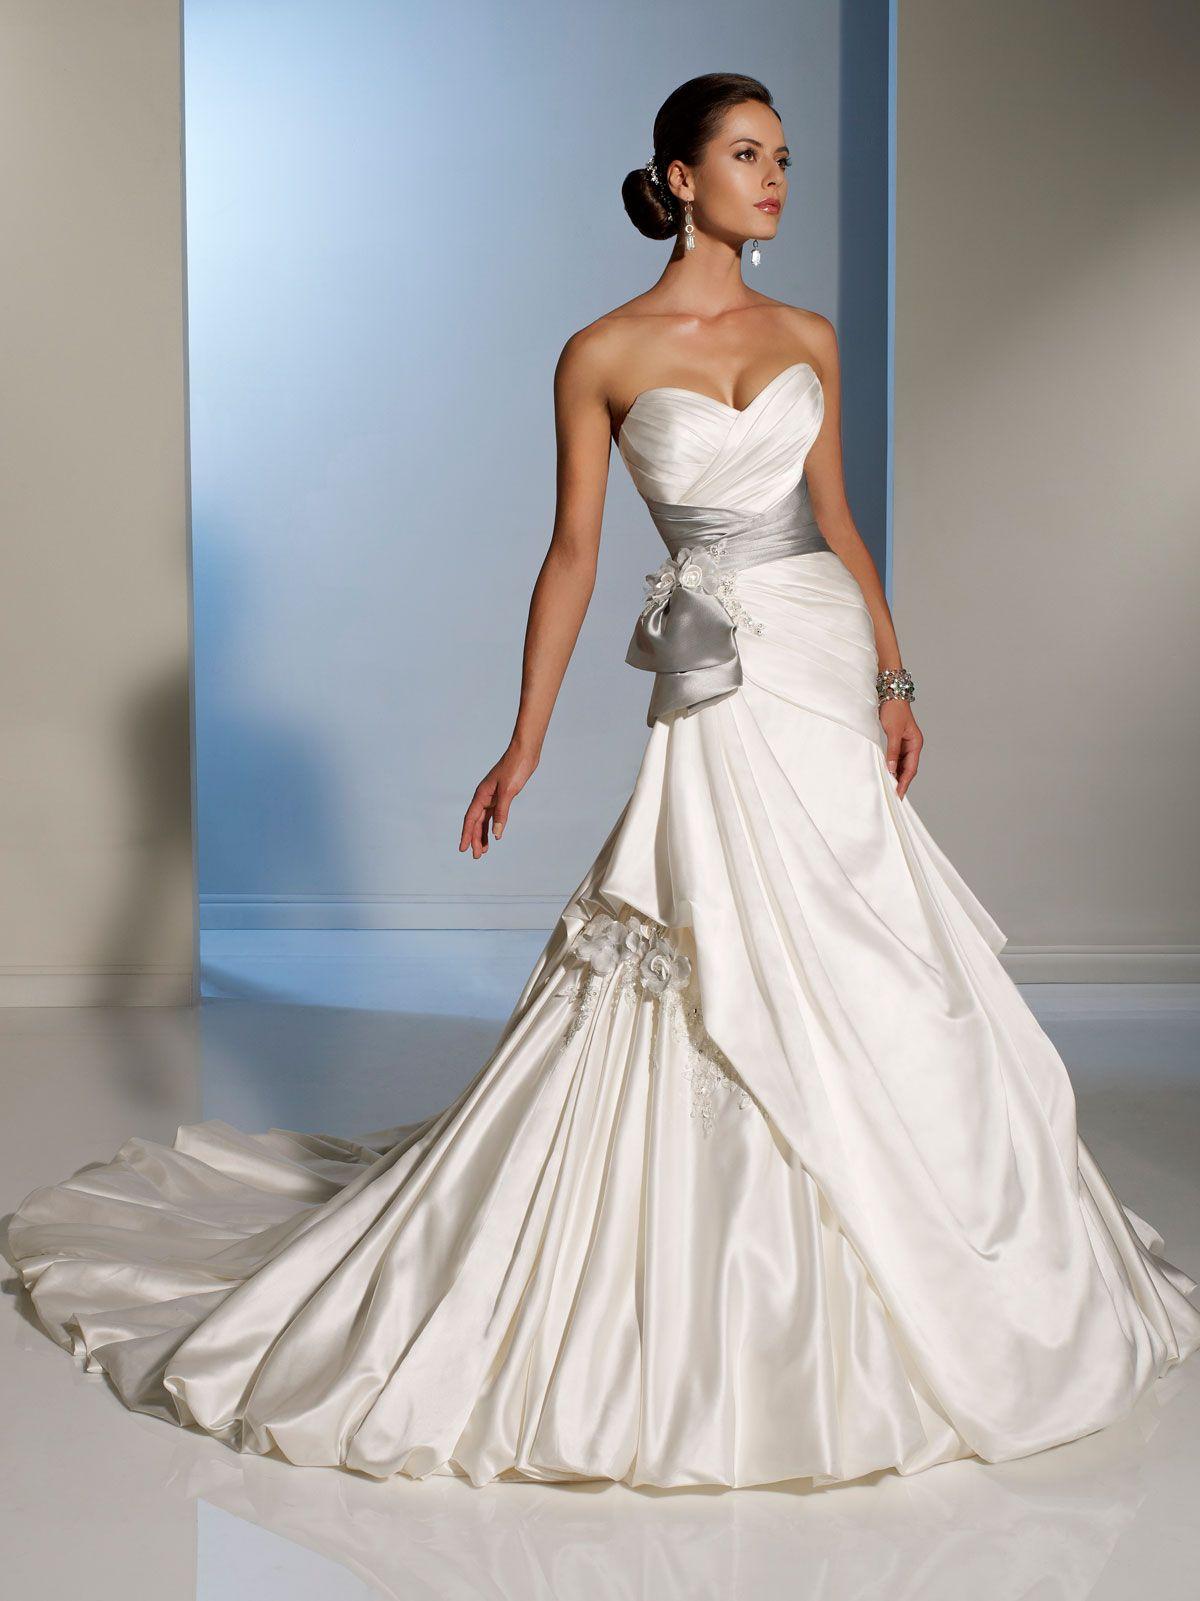 47+ White satin ball gown wedding dress ideas in 2021